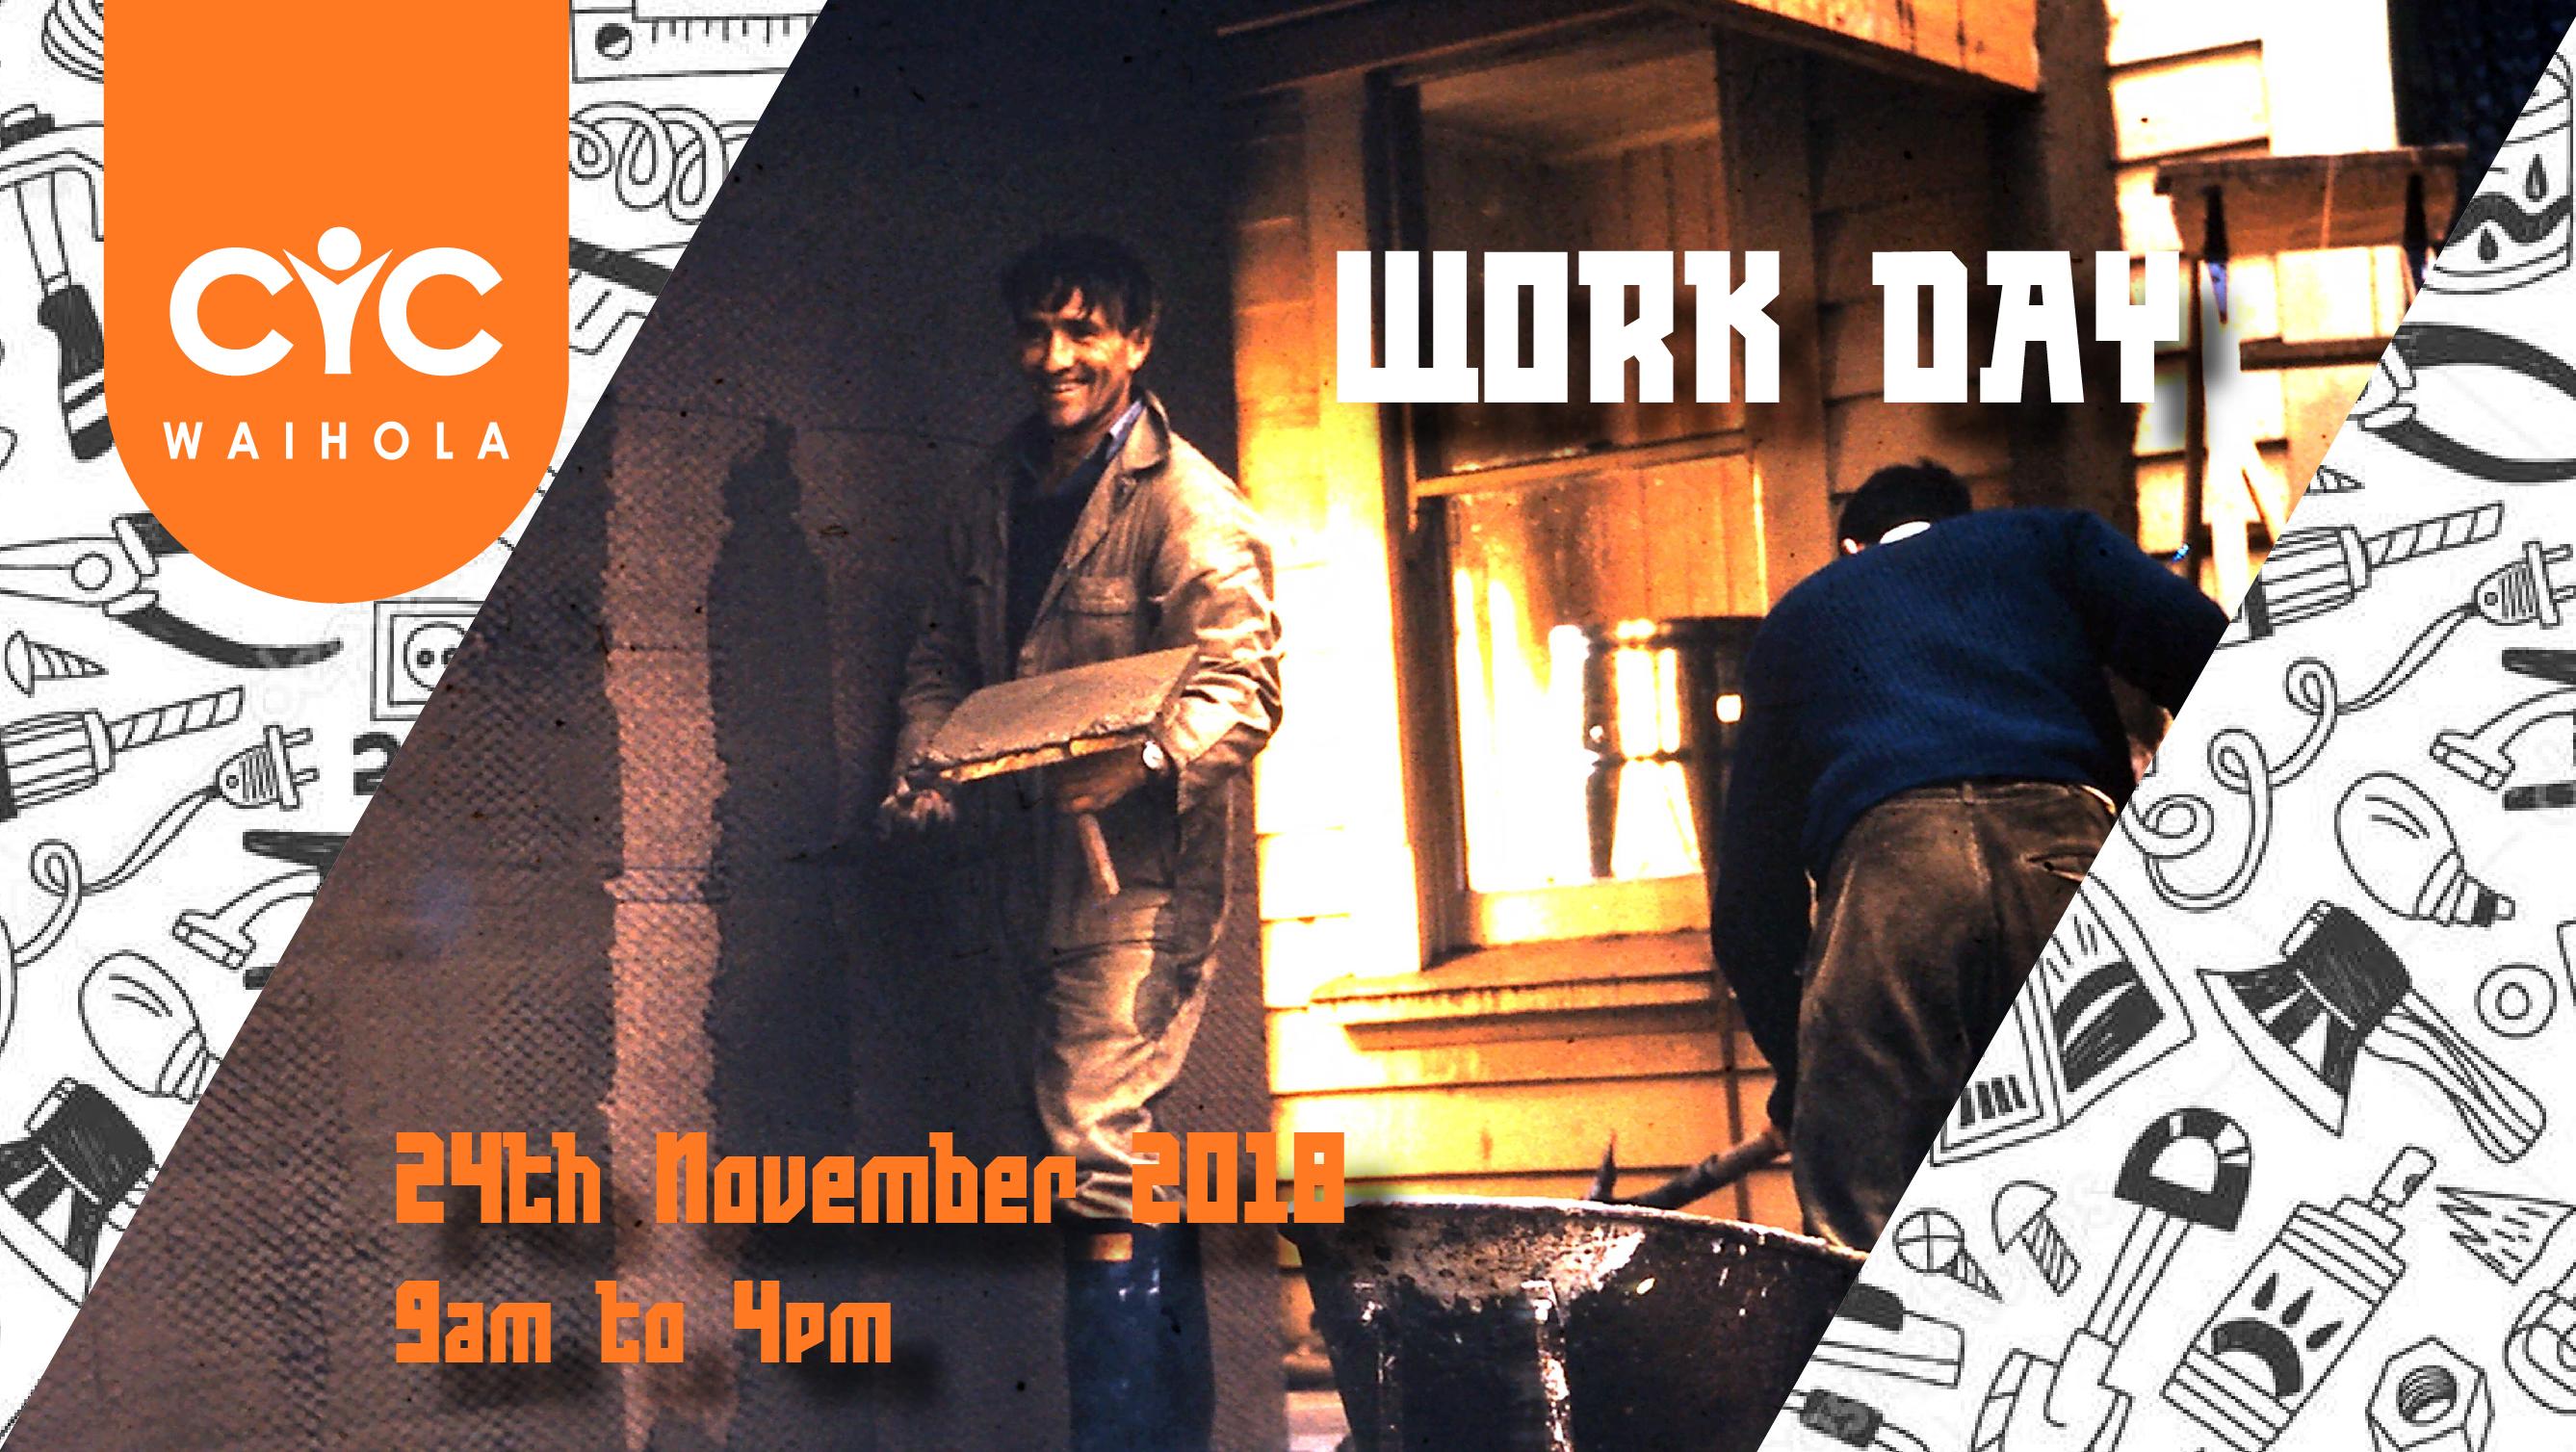 Work Day 24th November 2018